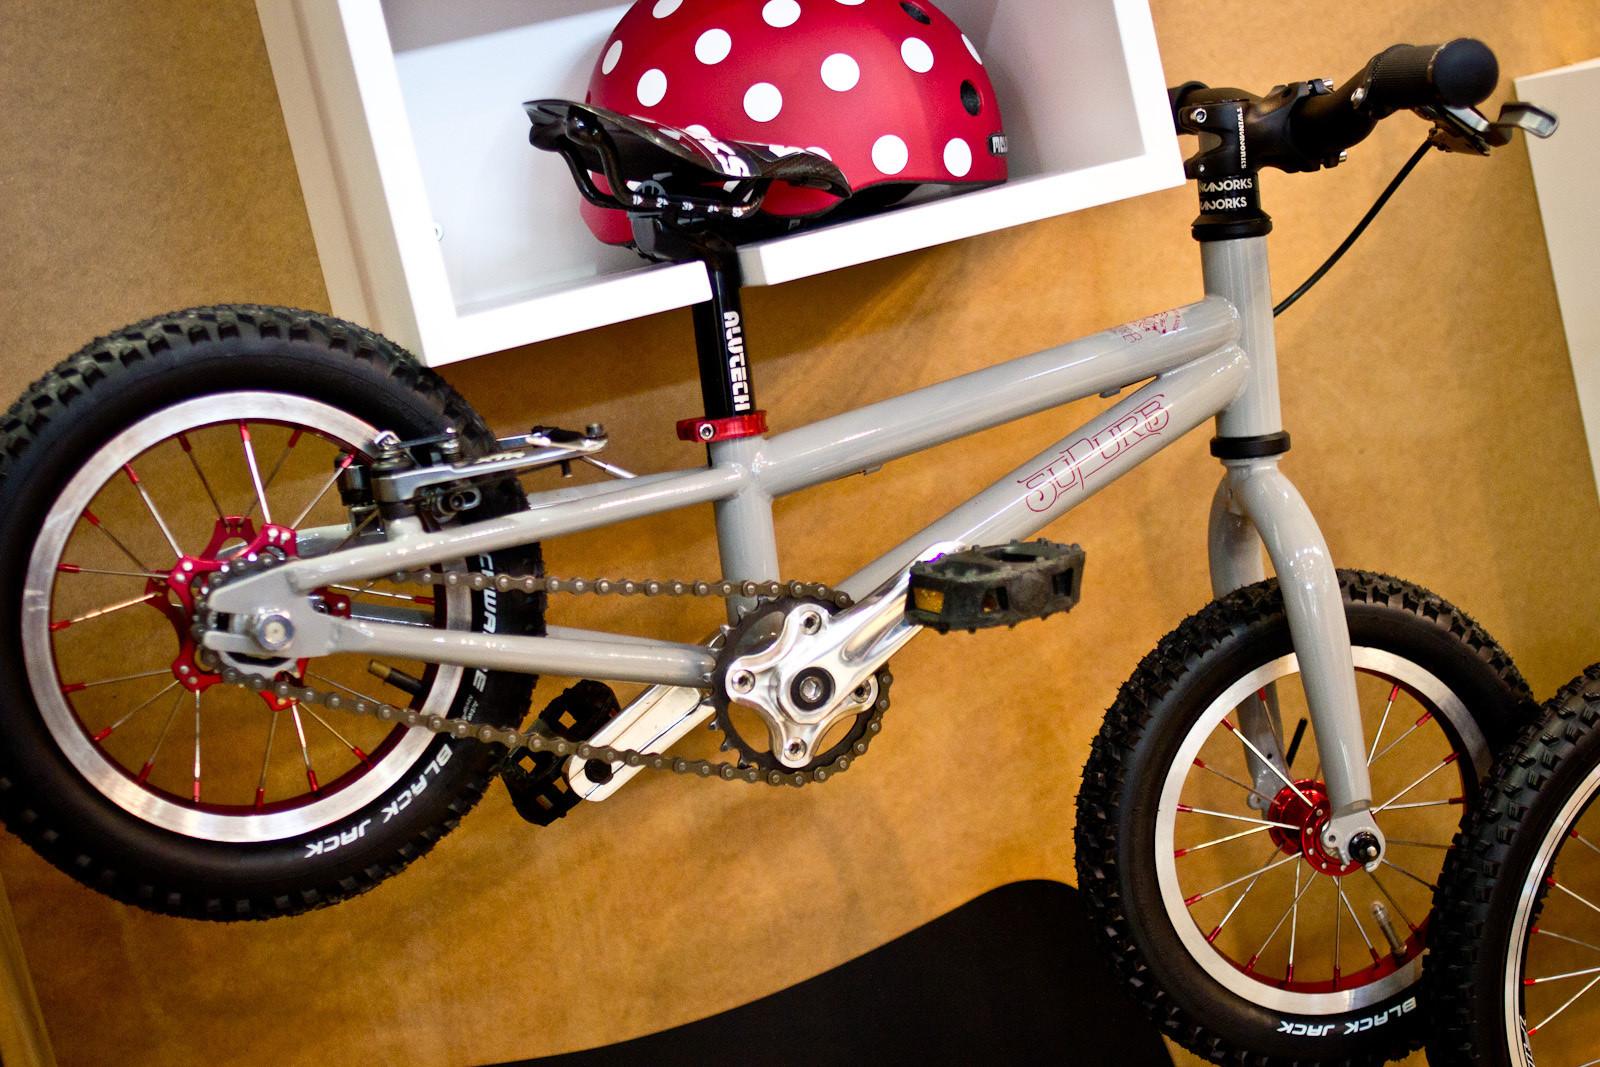 12 Rad Kid's Bikes from Eurobike: Supurb BO12 - 2014 Kids Bikes at Eurobike 2013 - Mountain Biking Pictures - Vital MTB